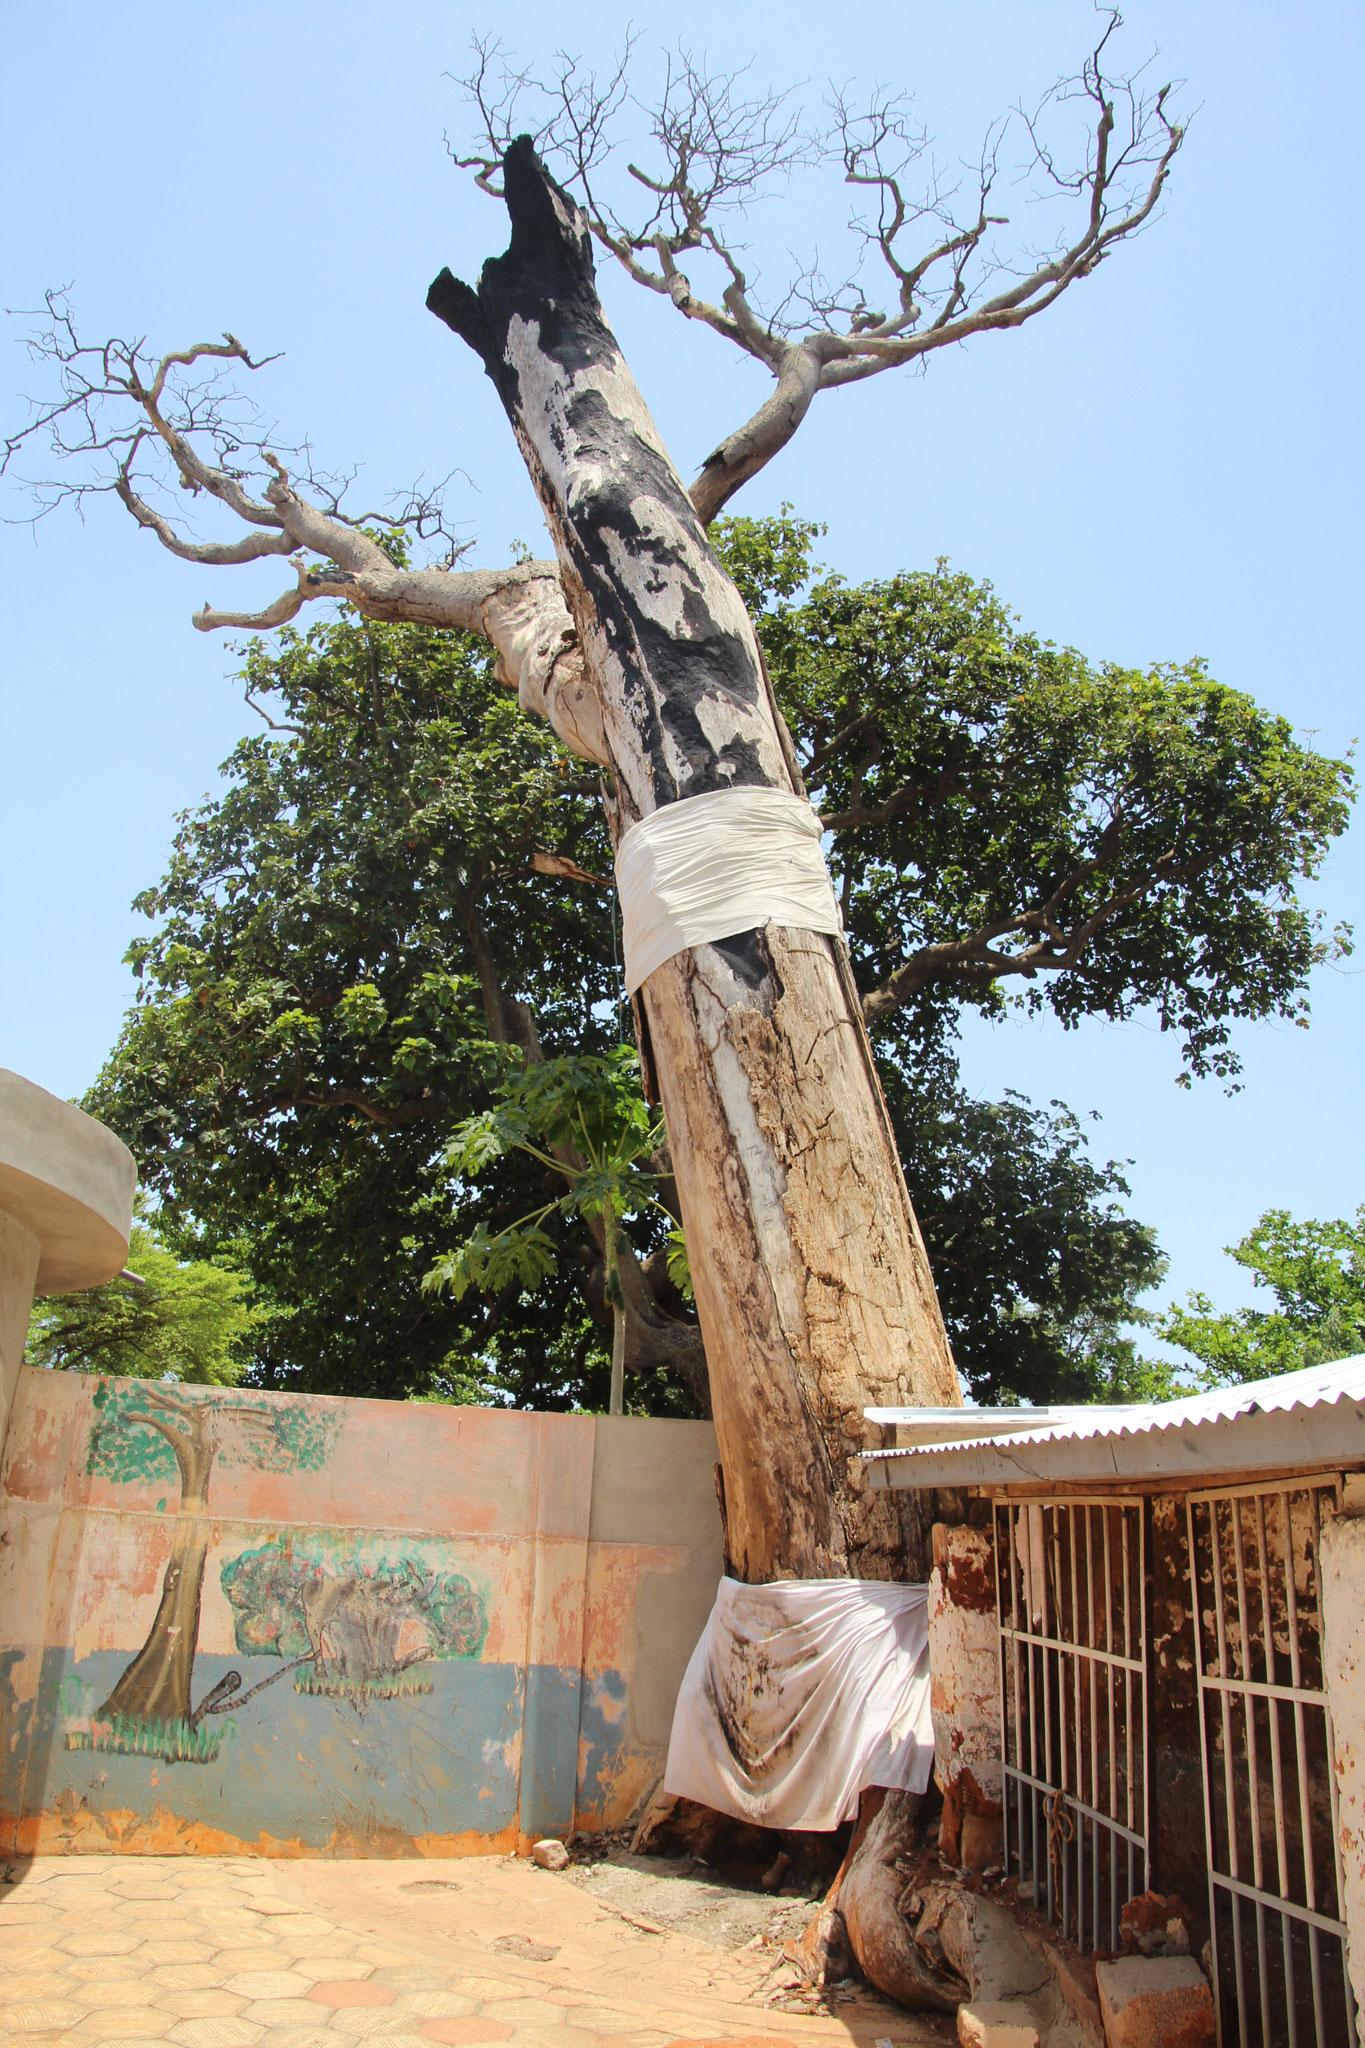 600 jähriger Baum.